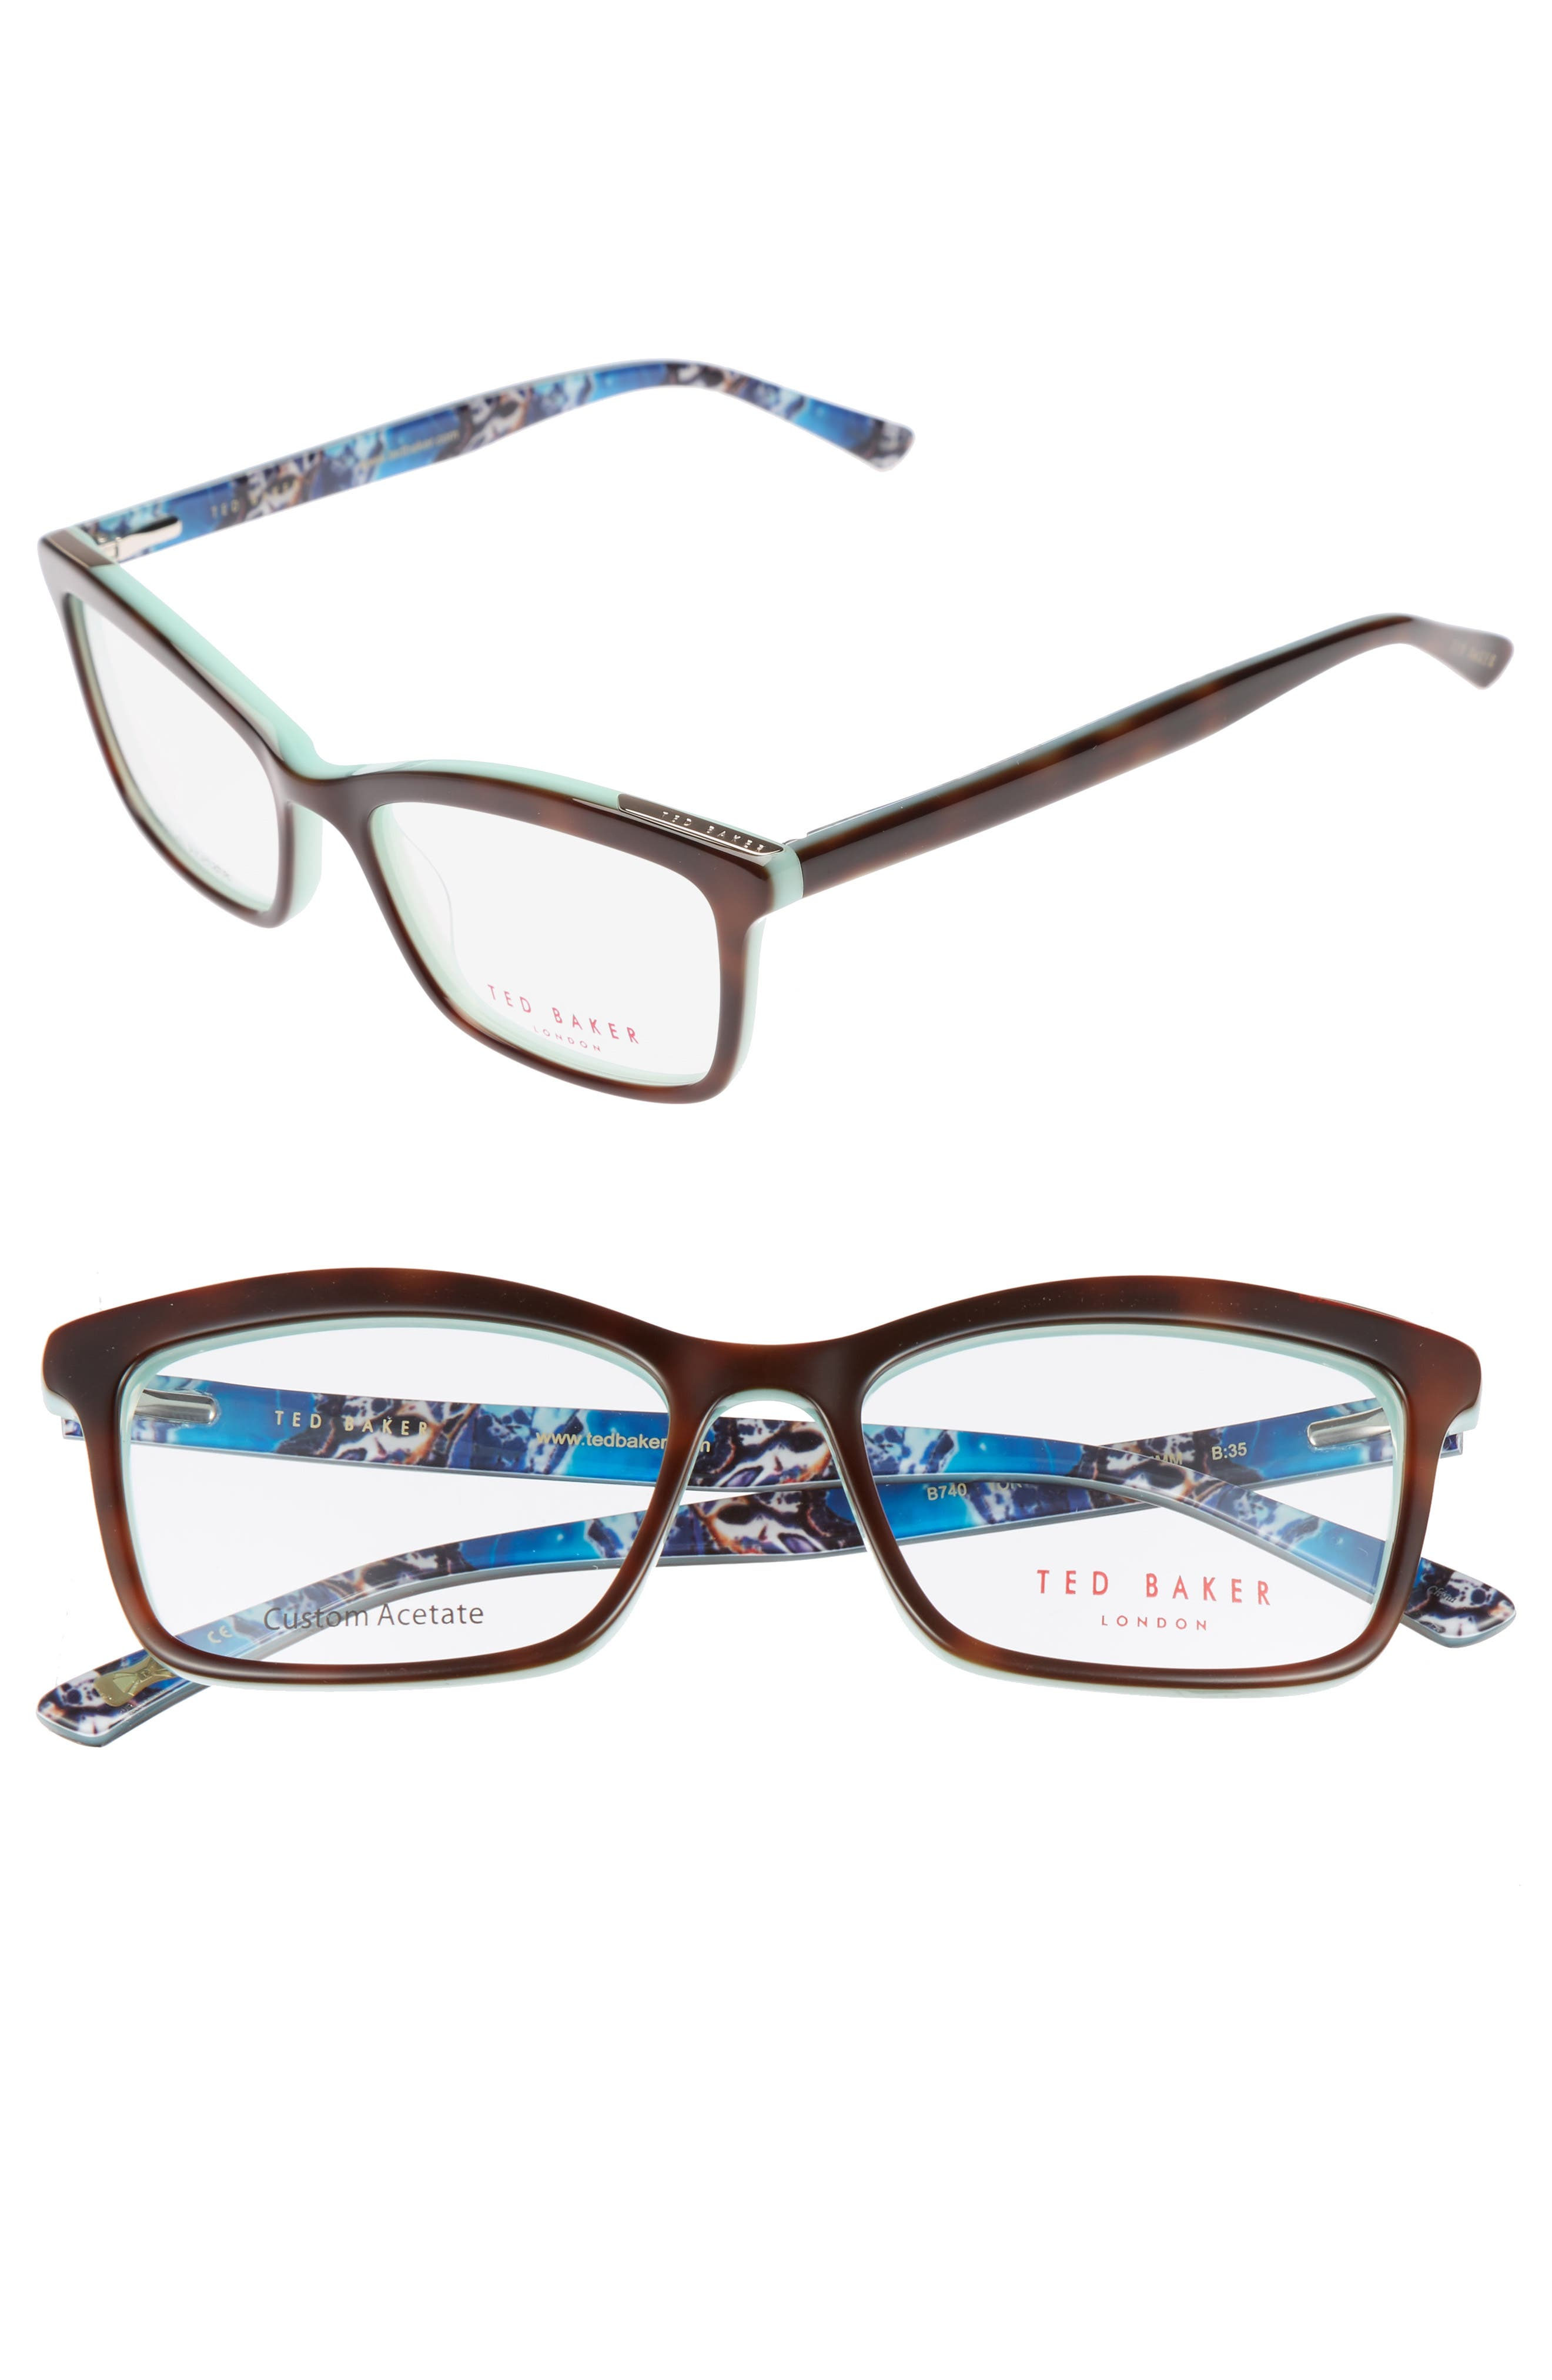 52mm Optical Glasses,                             Main thumbnail 1, color,                             Tortoise